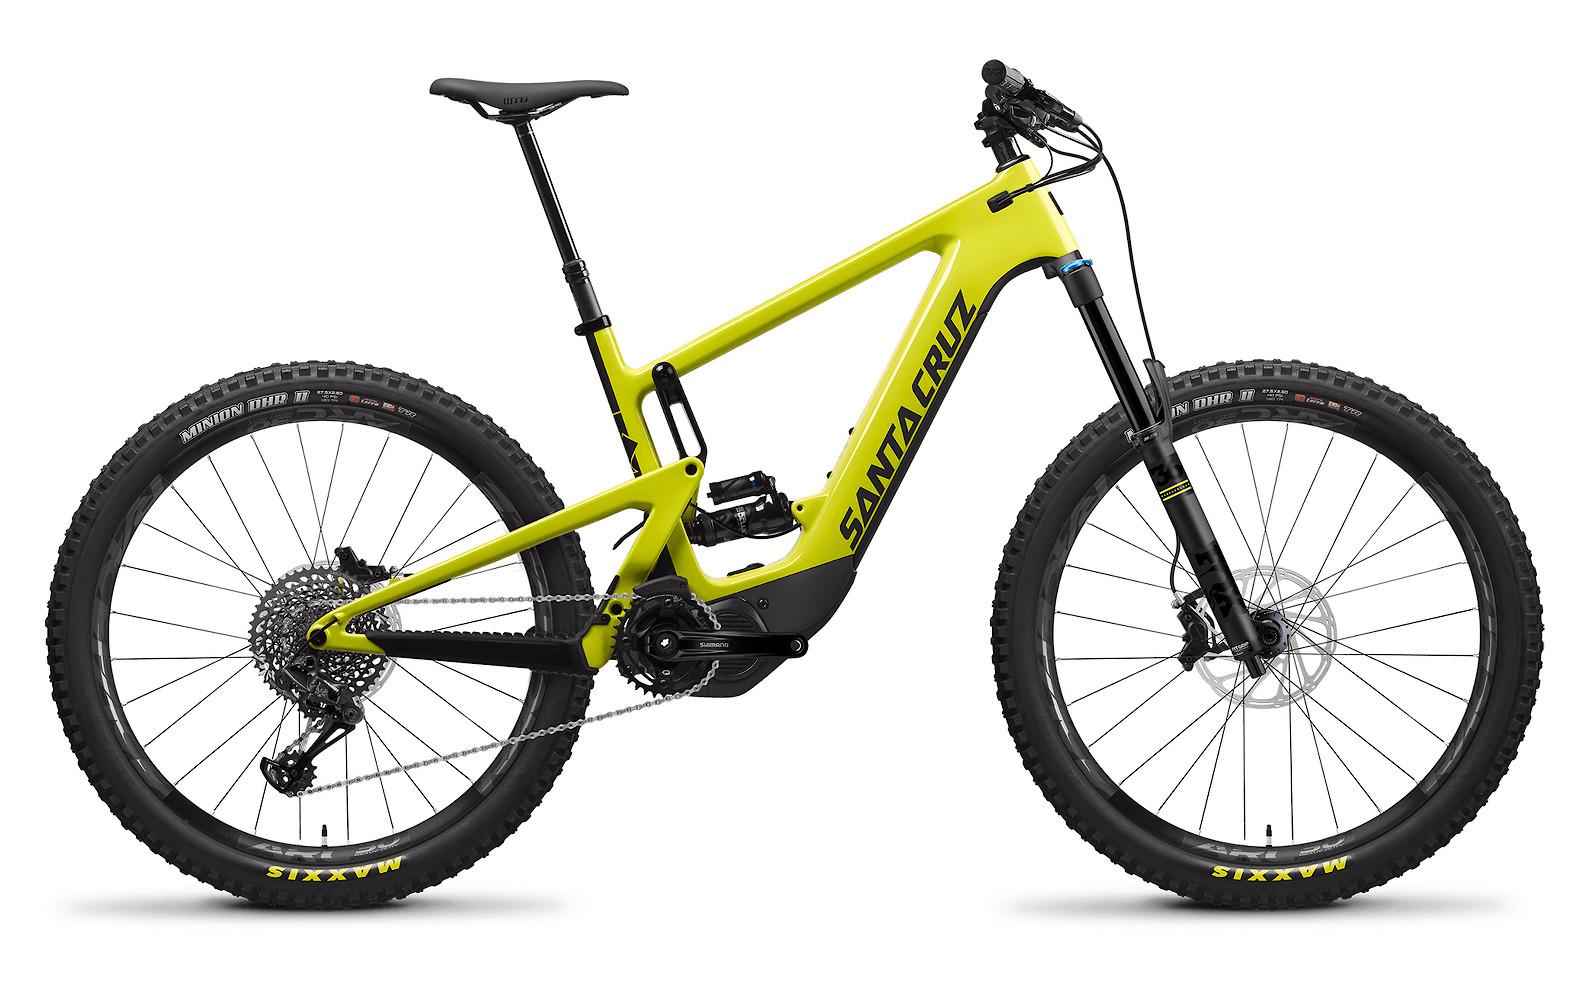 2020 Santa Cruz Heckler Carbon CC S (Yellowjacket and Black)